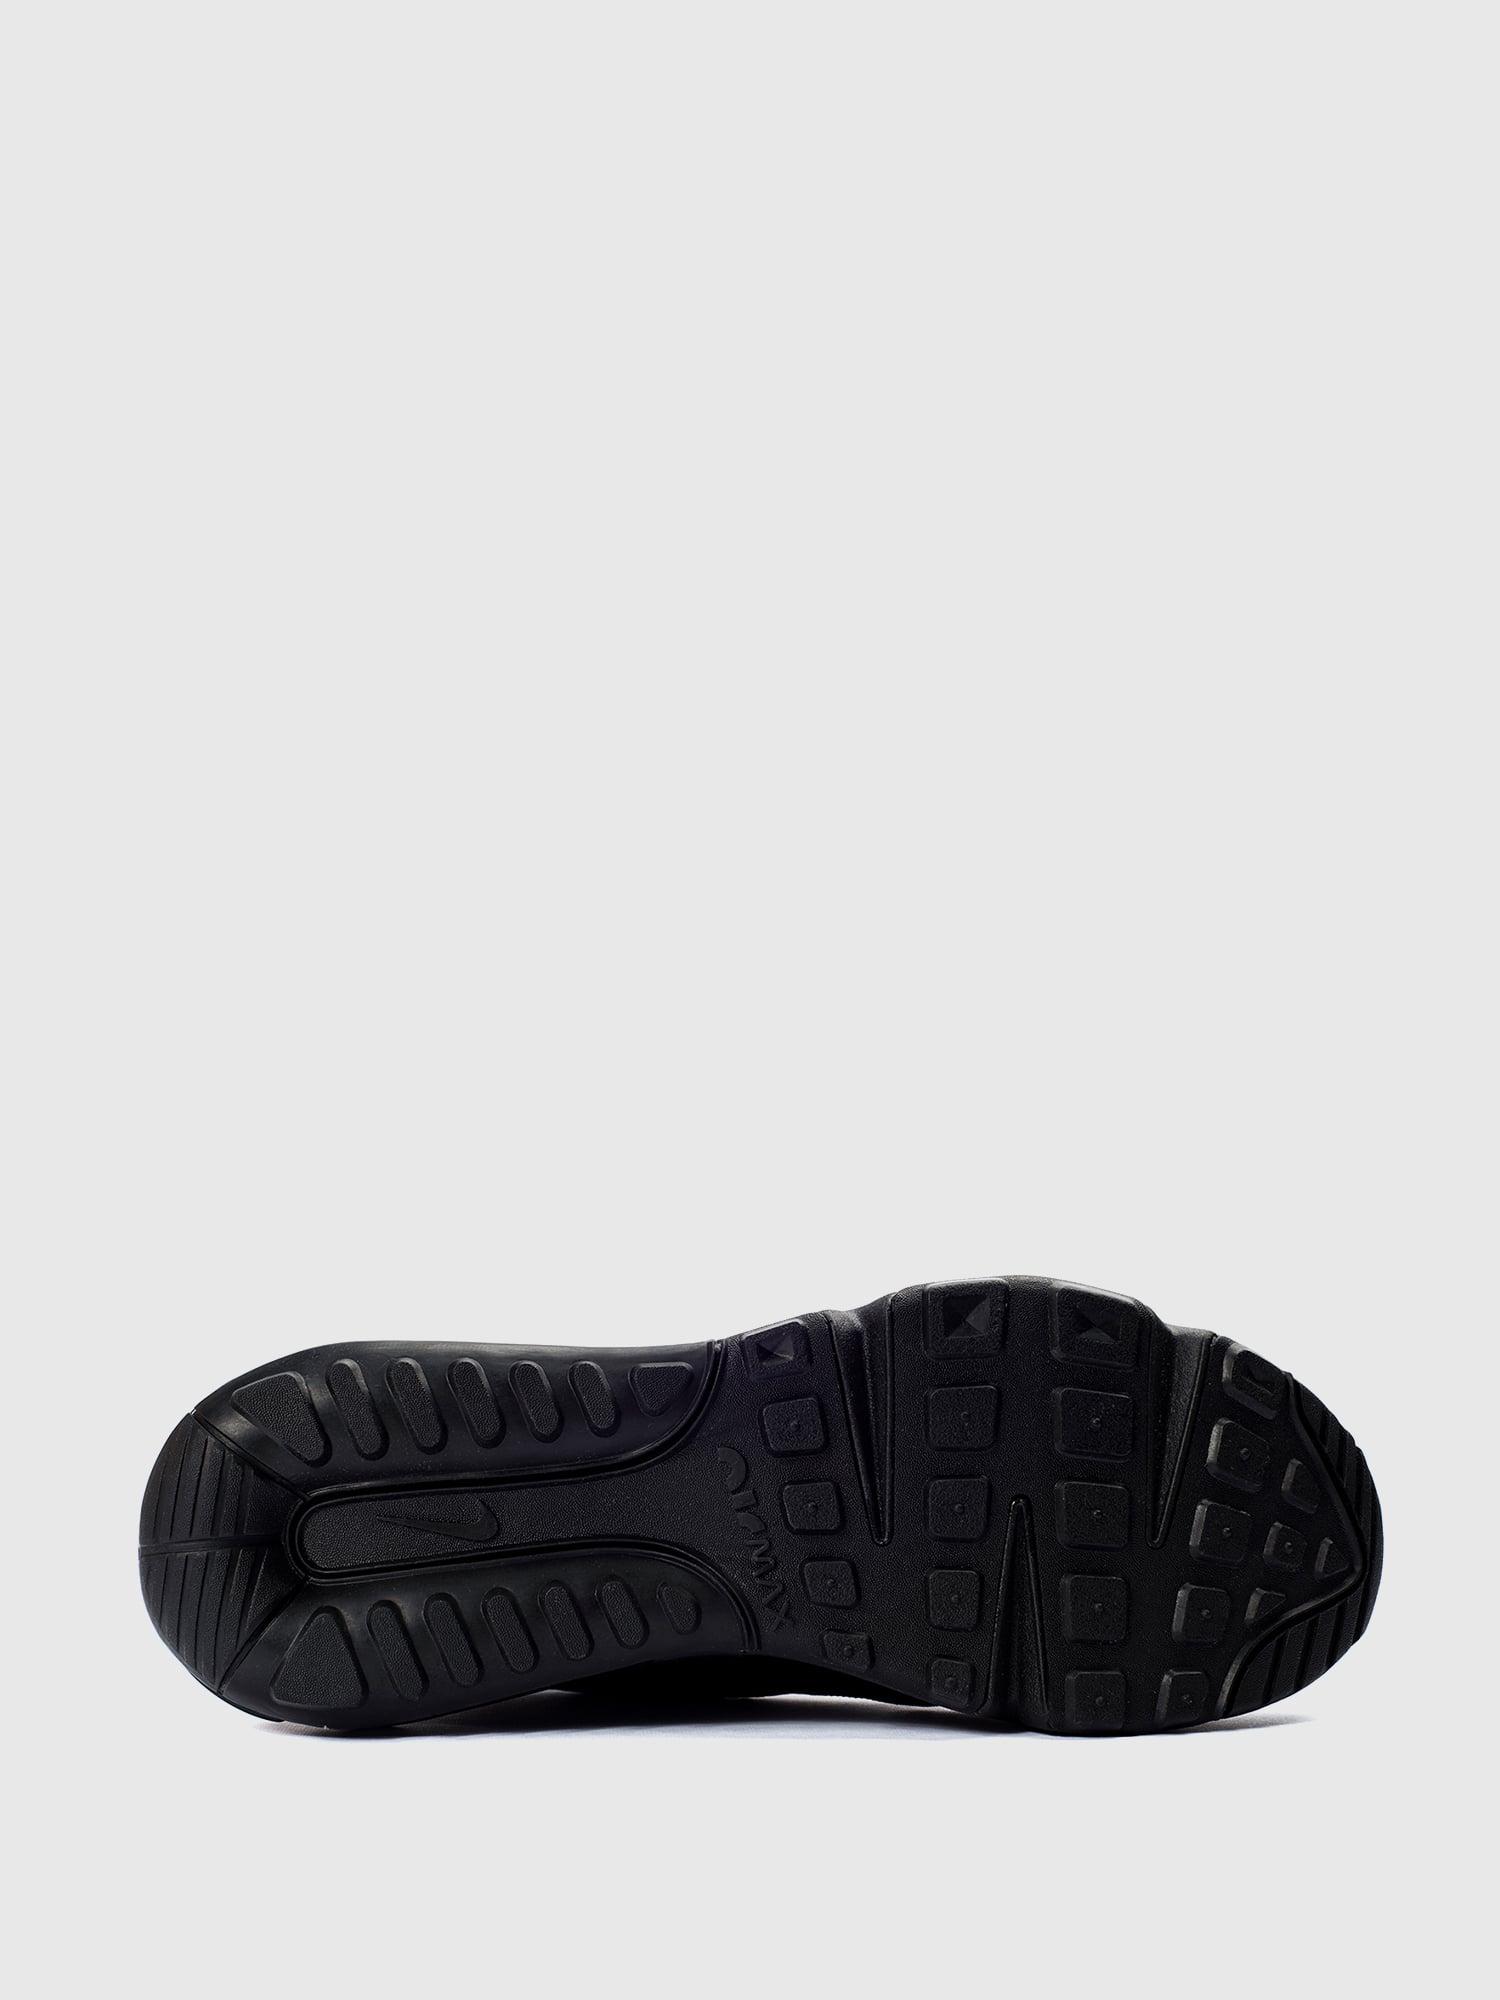 Nike Air Max 2090 Black Wolf Grey